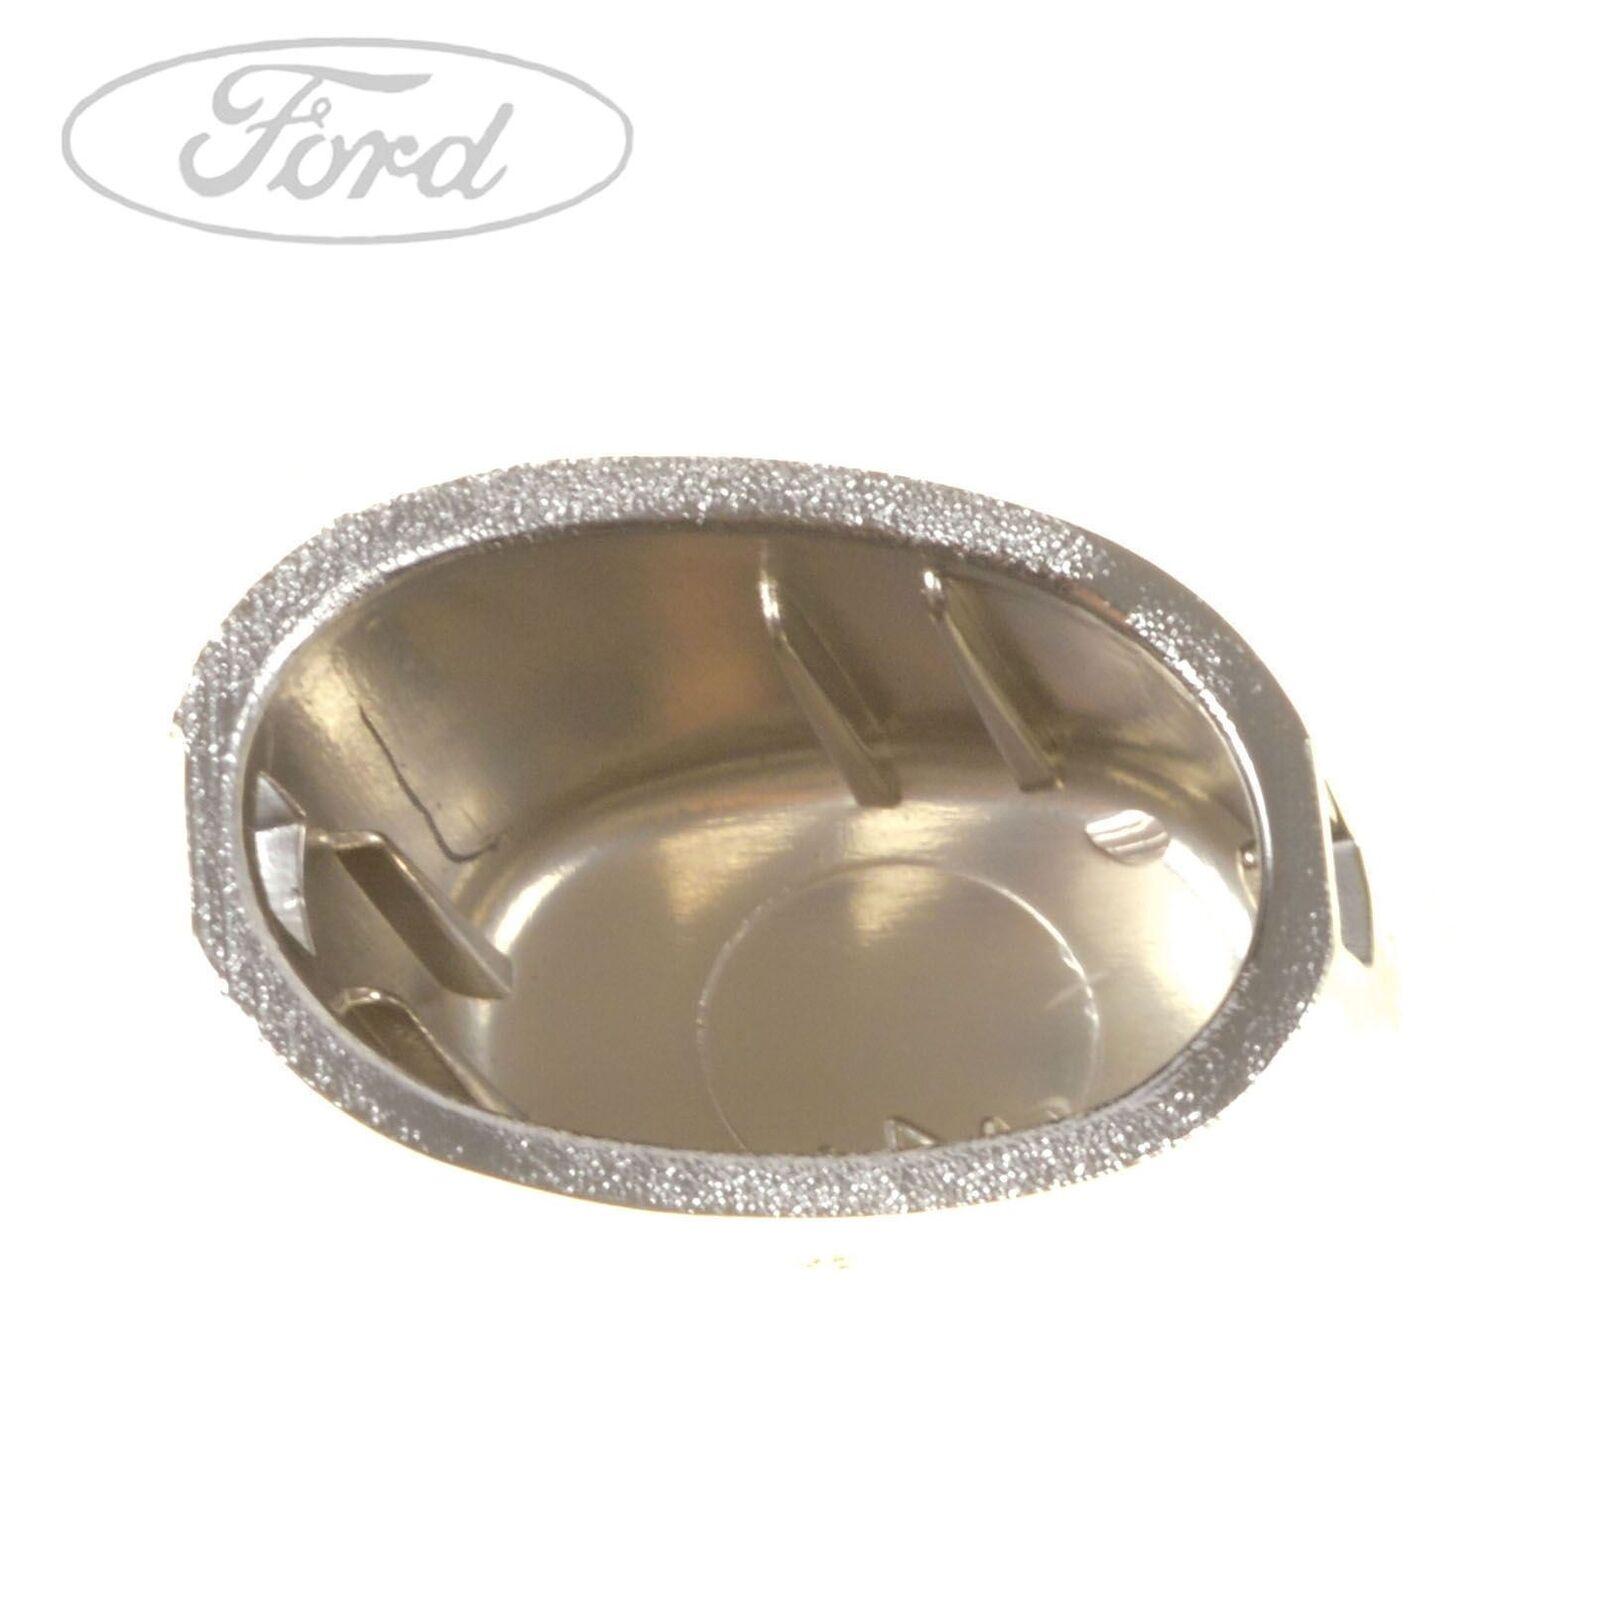 Genuine Ford Focus Inc C-MAX Chrome Handbrake Button 1447426